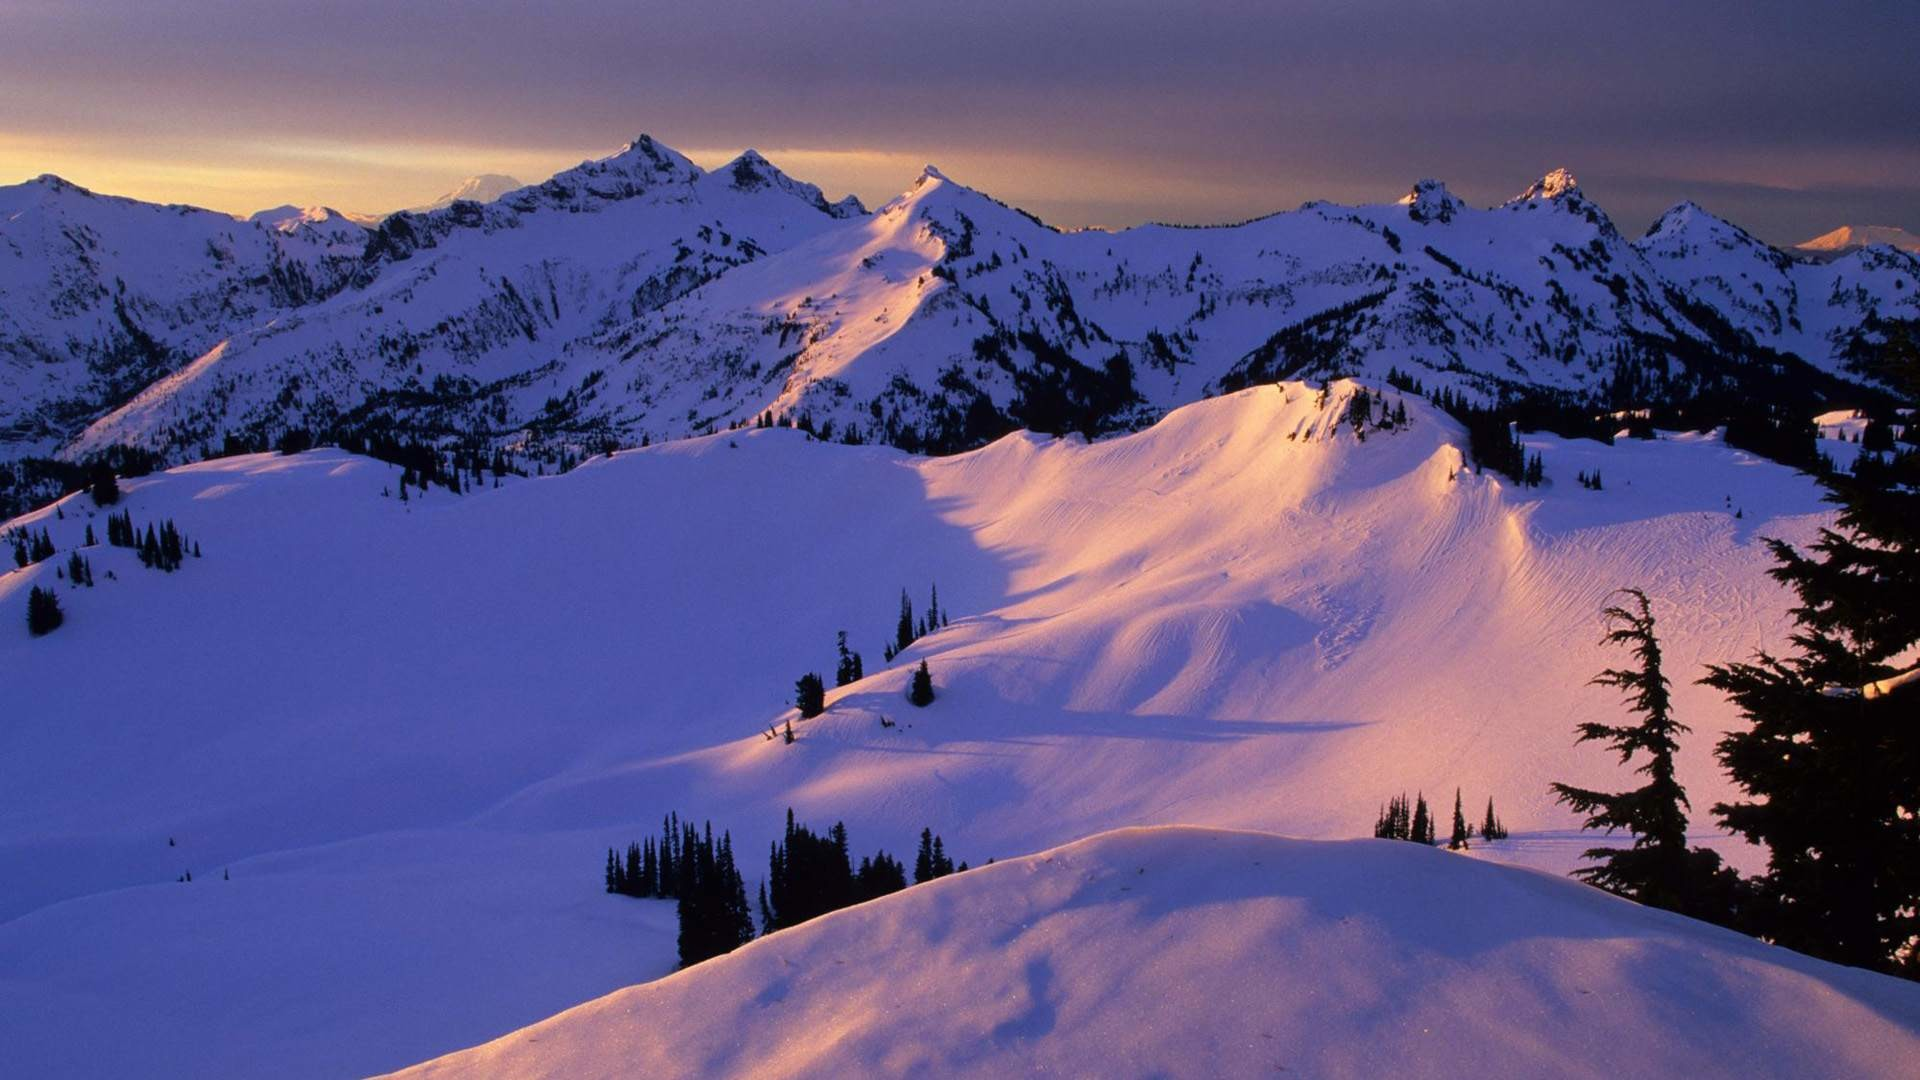 Snow Mountain Sunset Wallpaper | NanoBit Technology